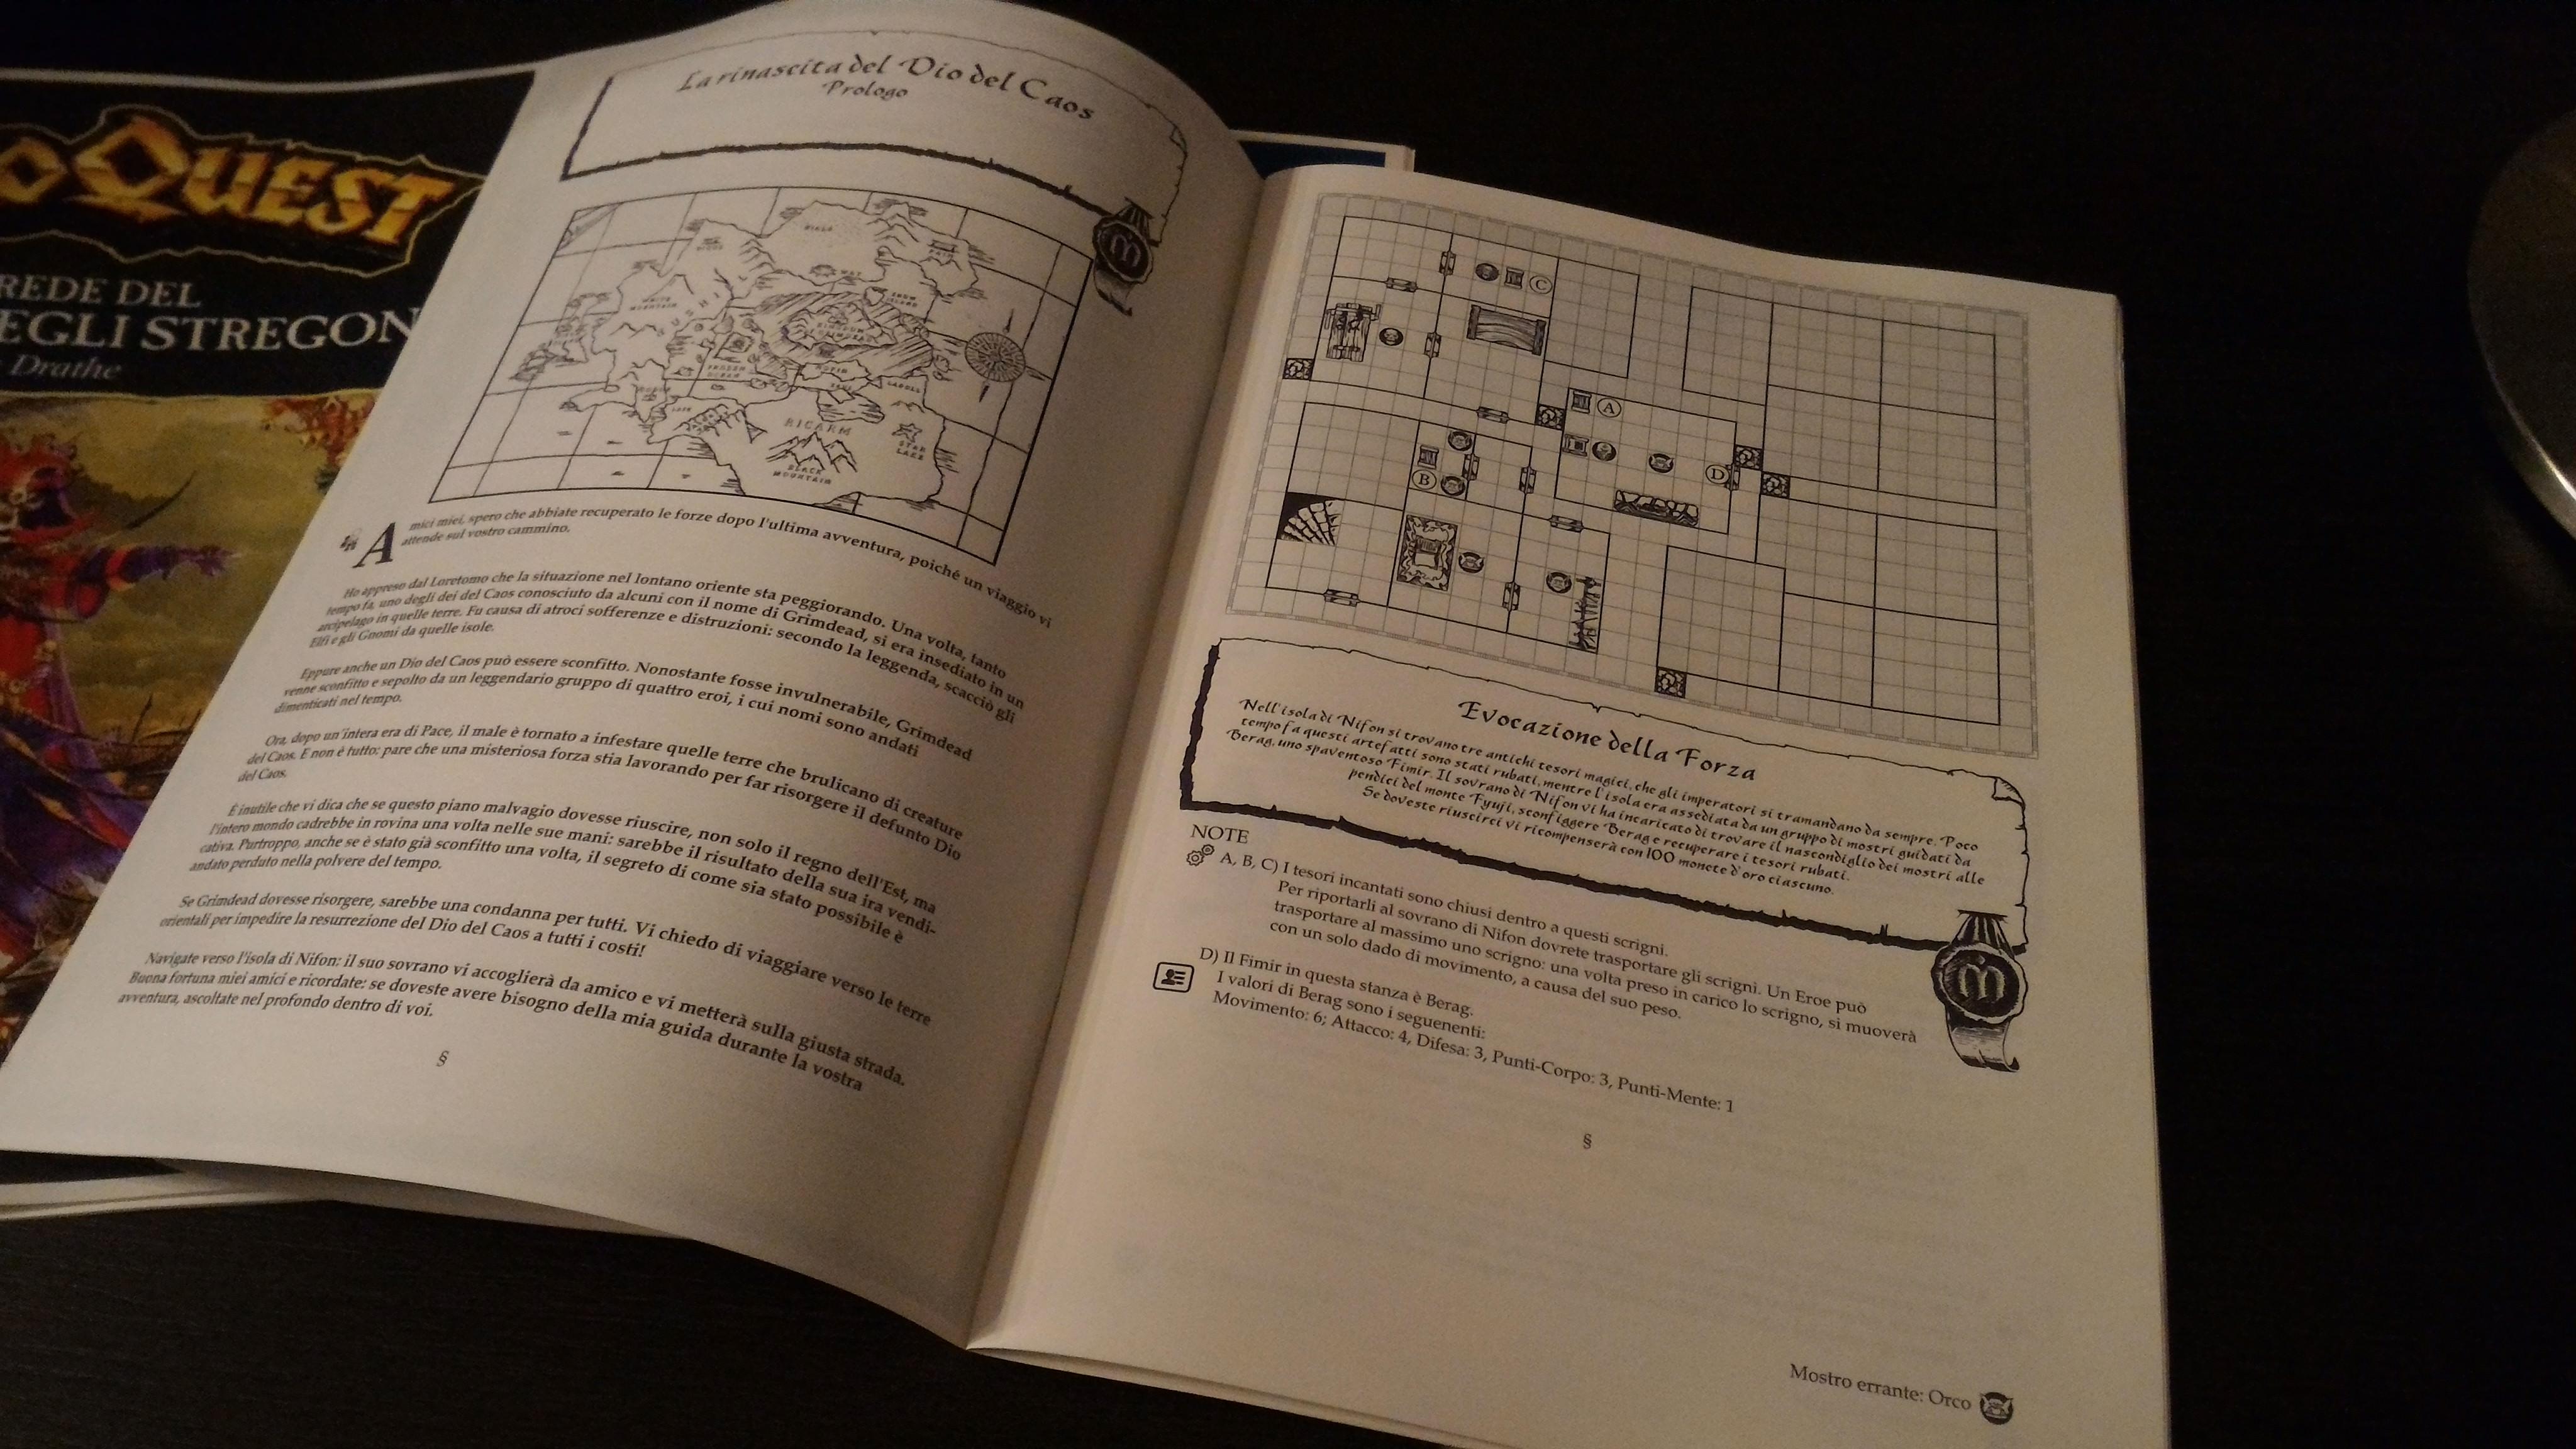 QuestBook-HeroQuest(6).jpg